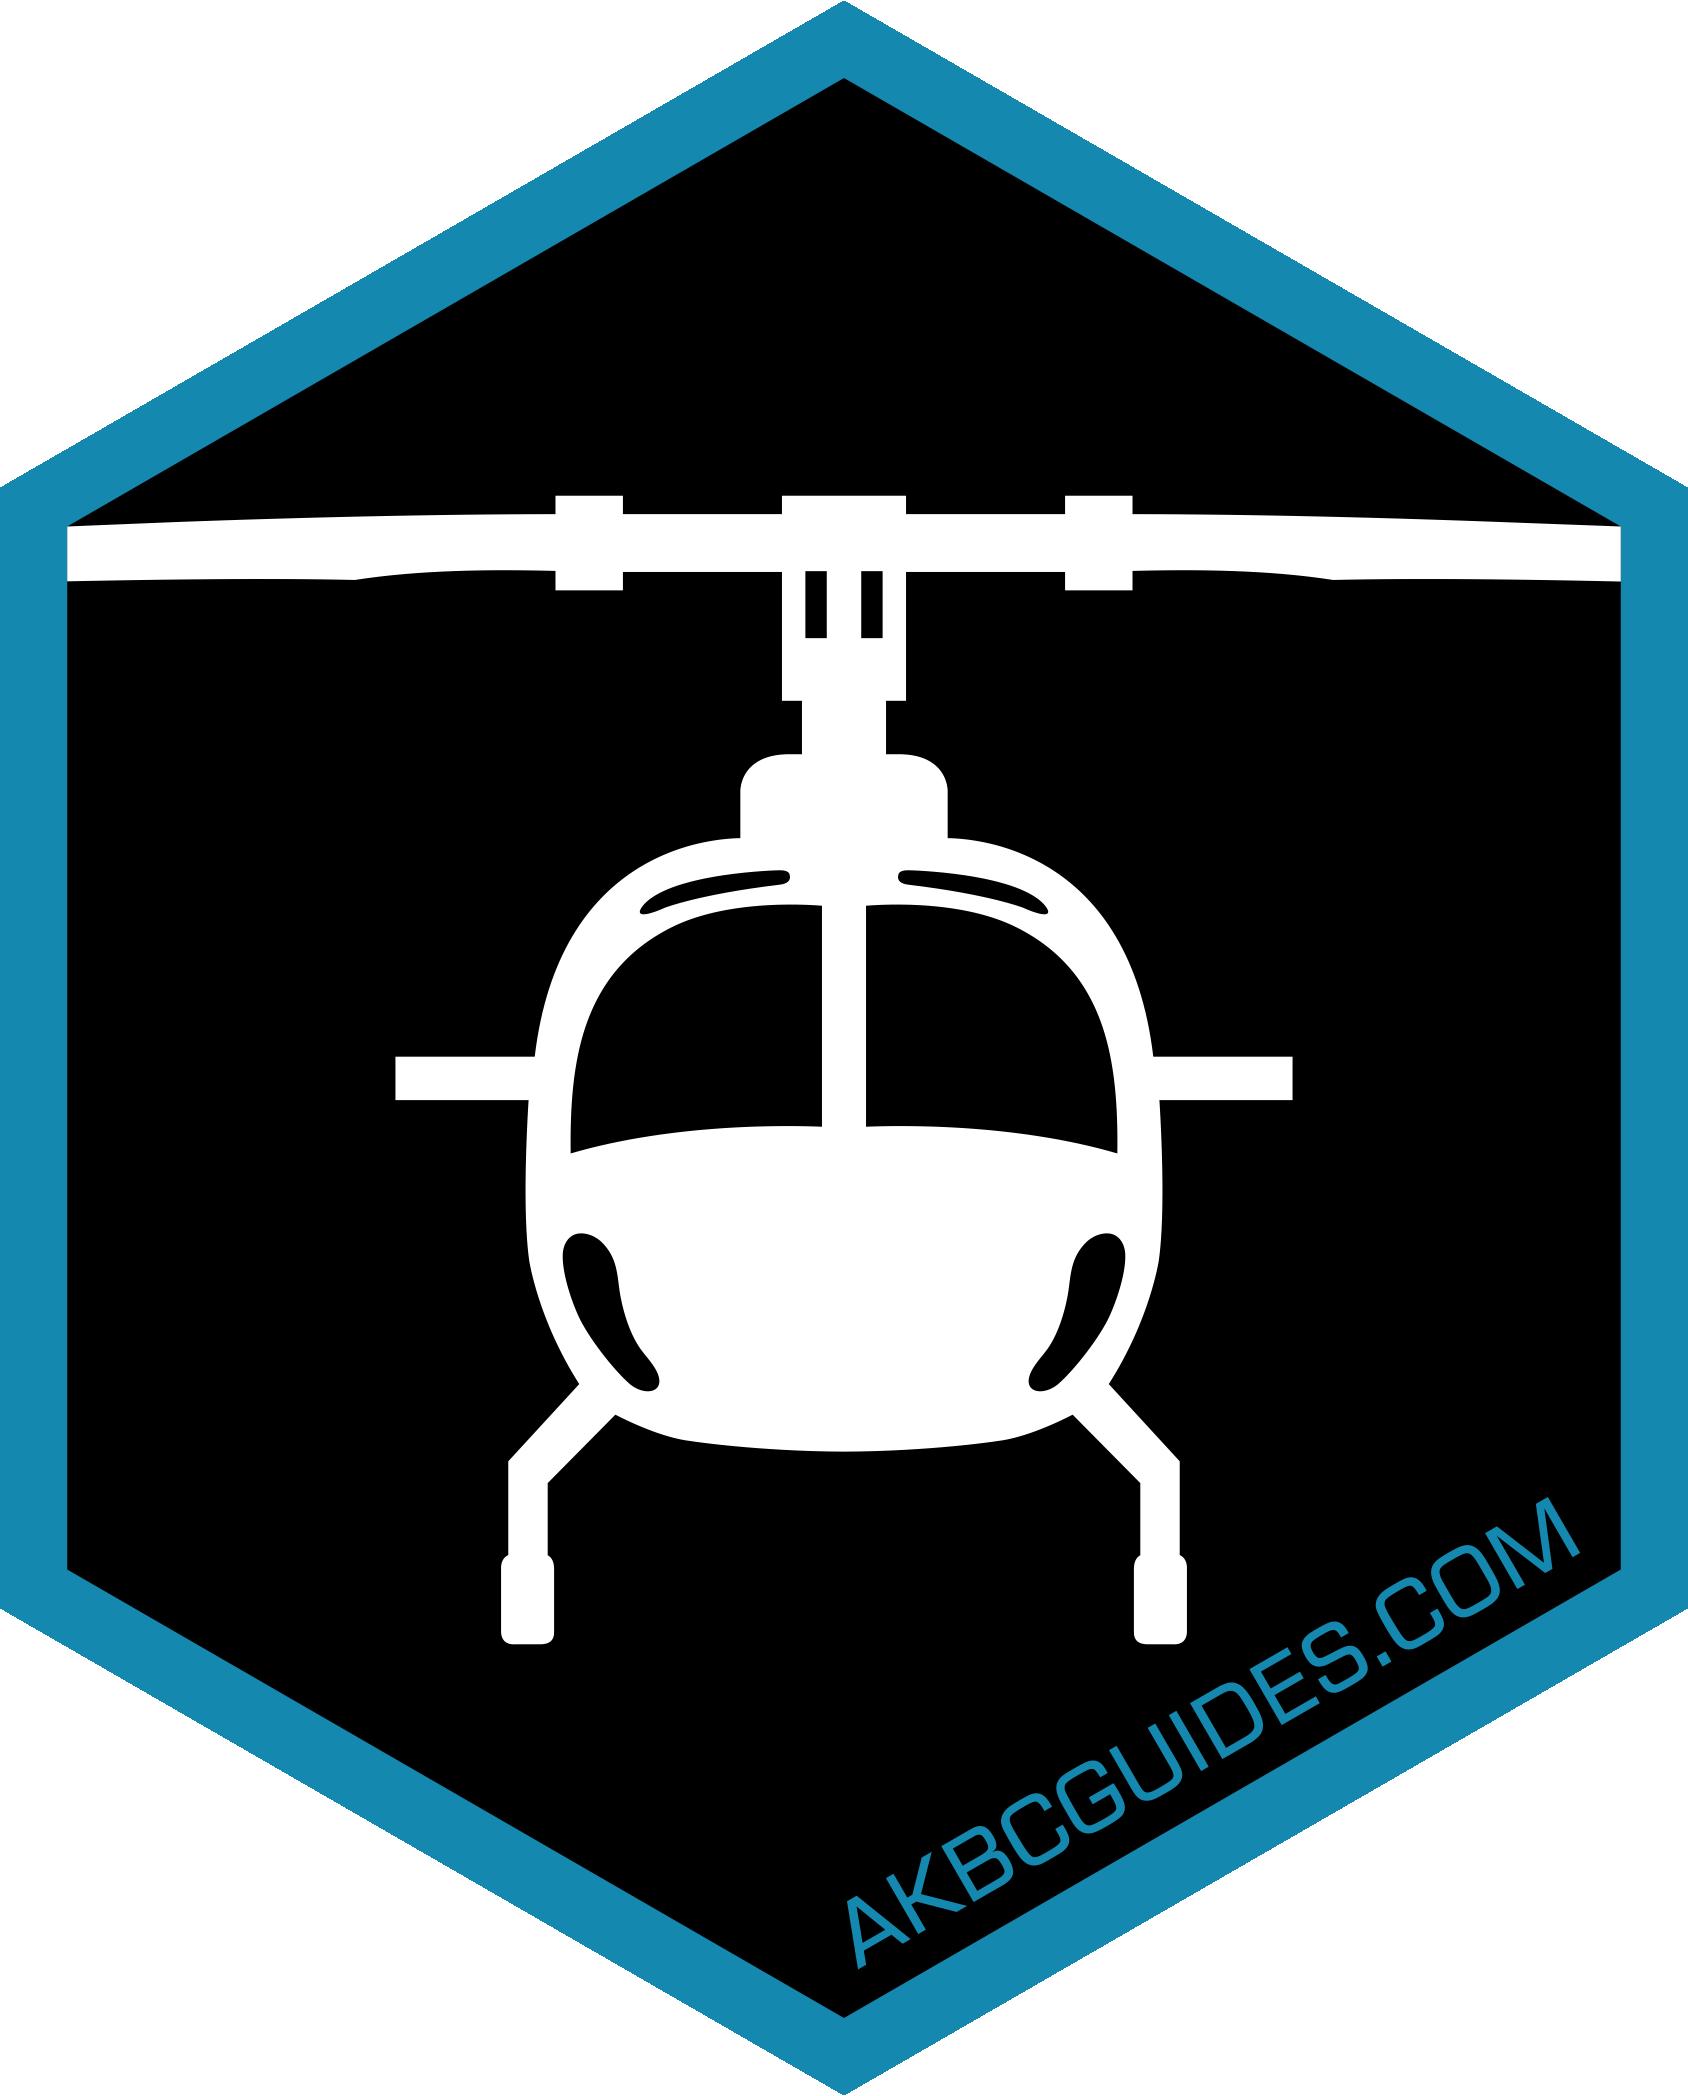 Edit existing logo